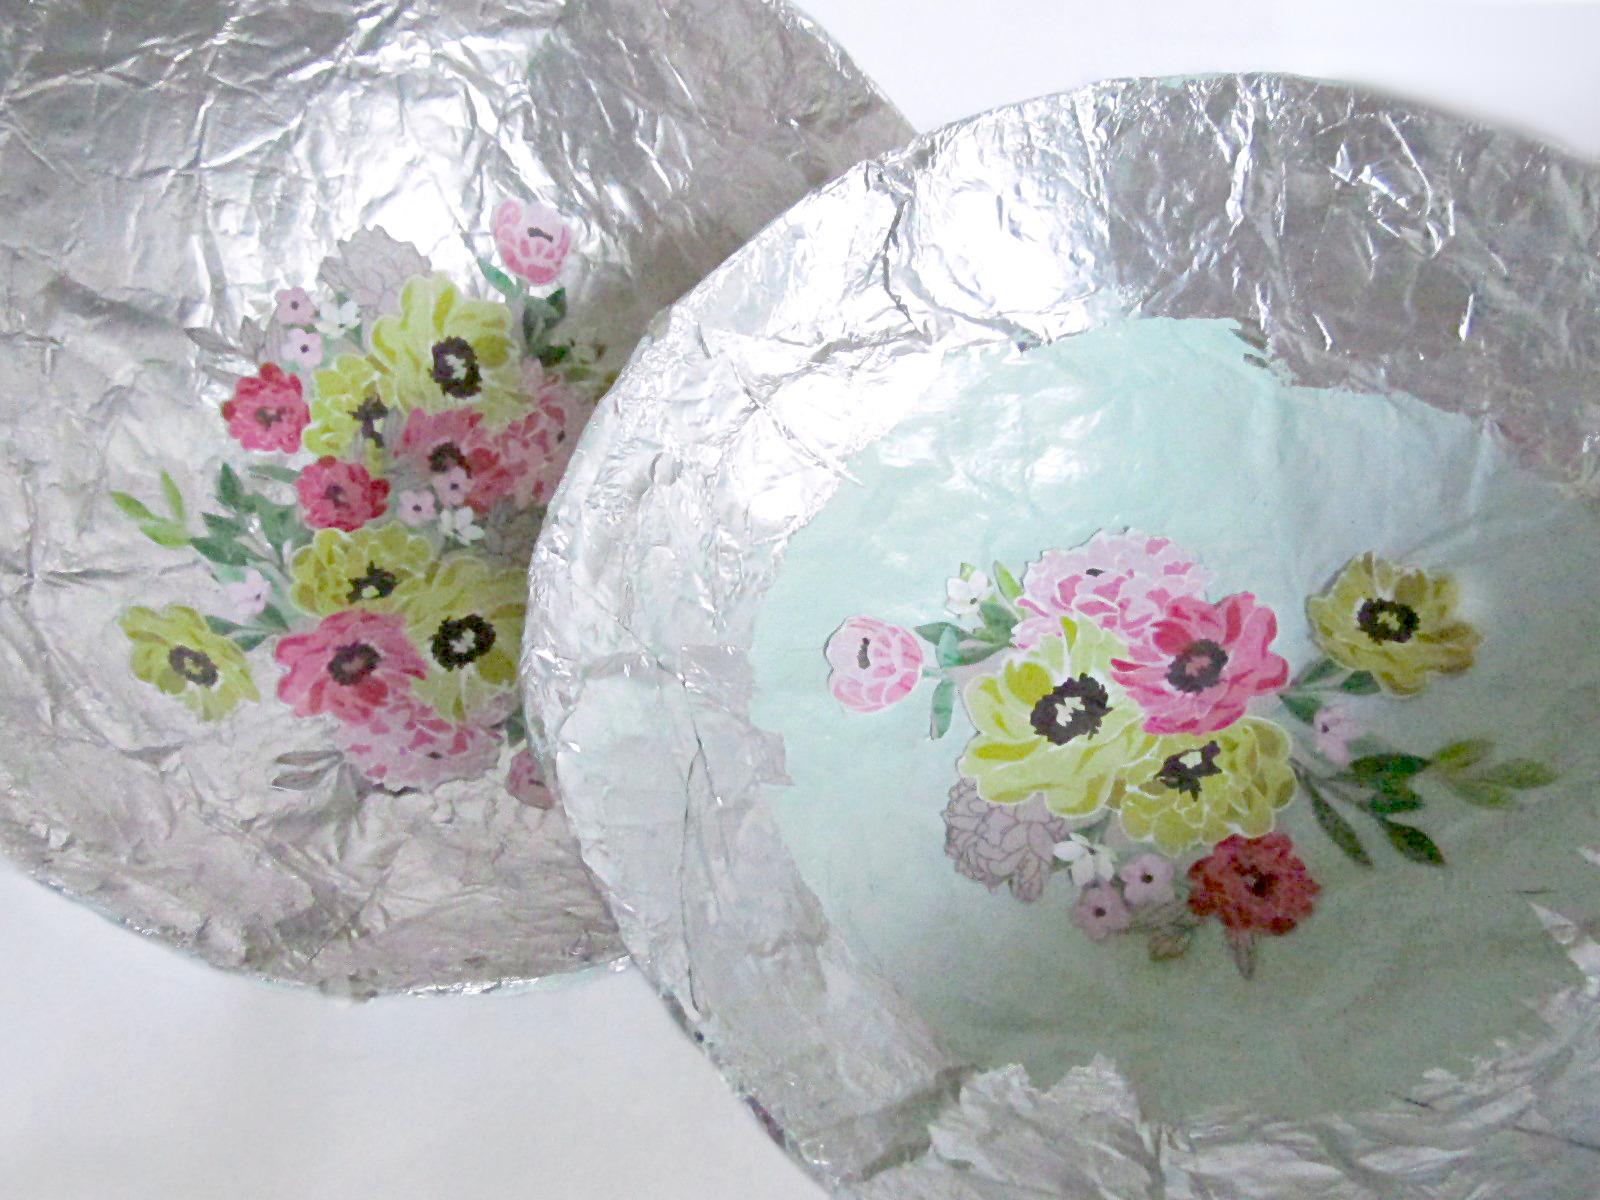 Diy paper mache bowls by newly mynted julie ann art for Diy paper bowl